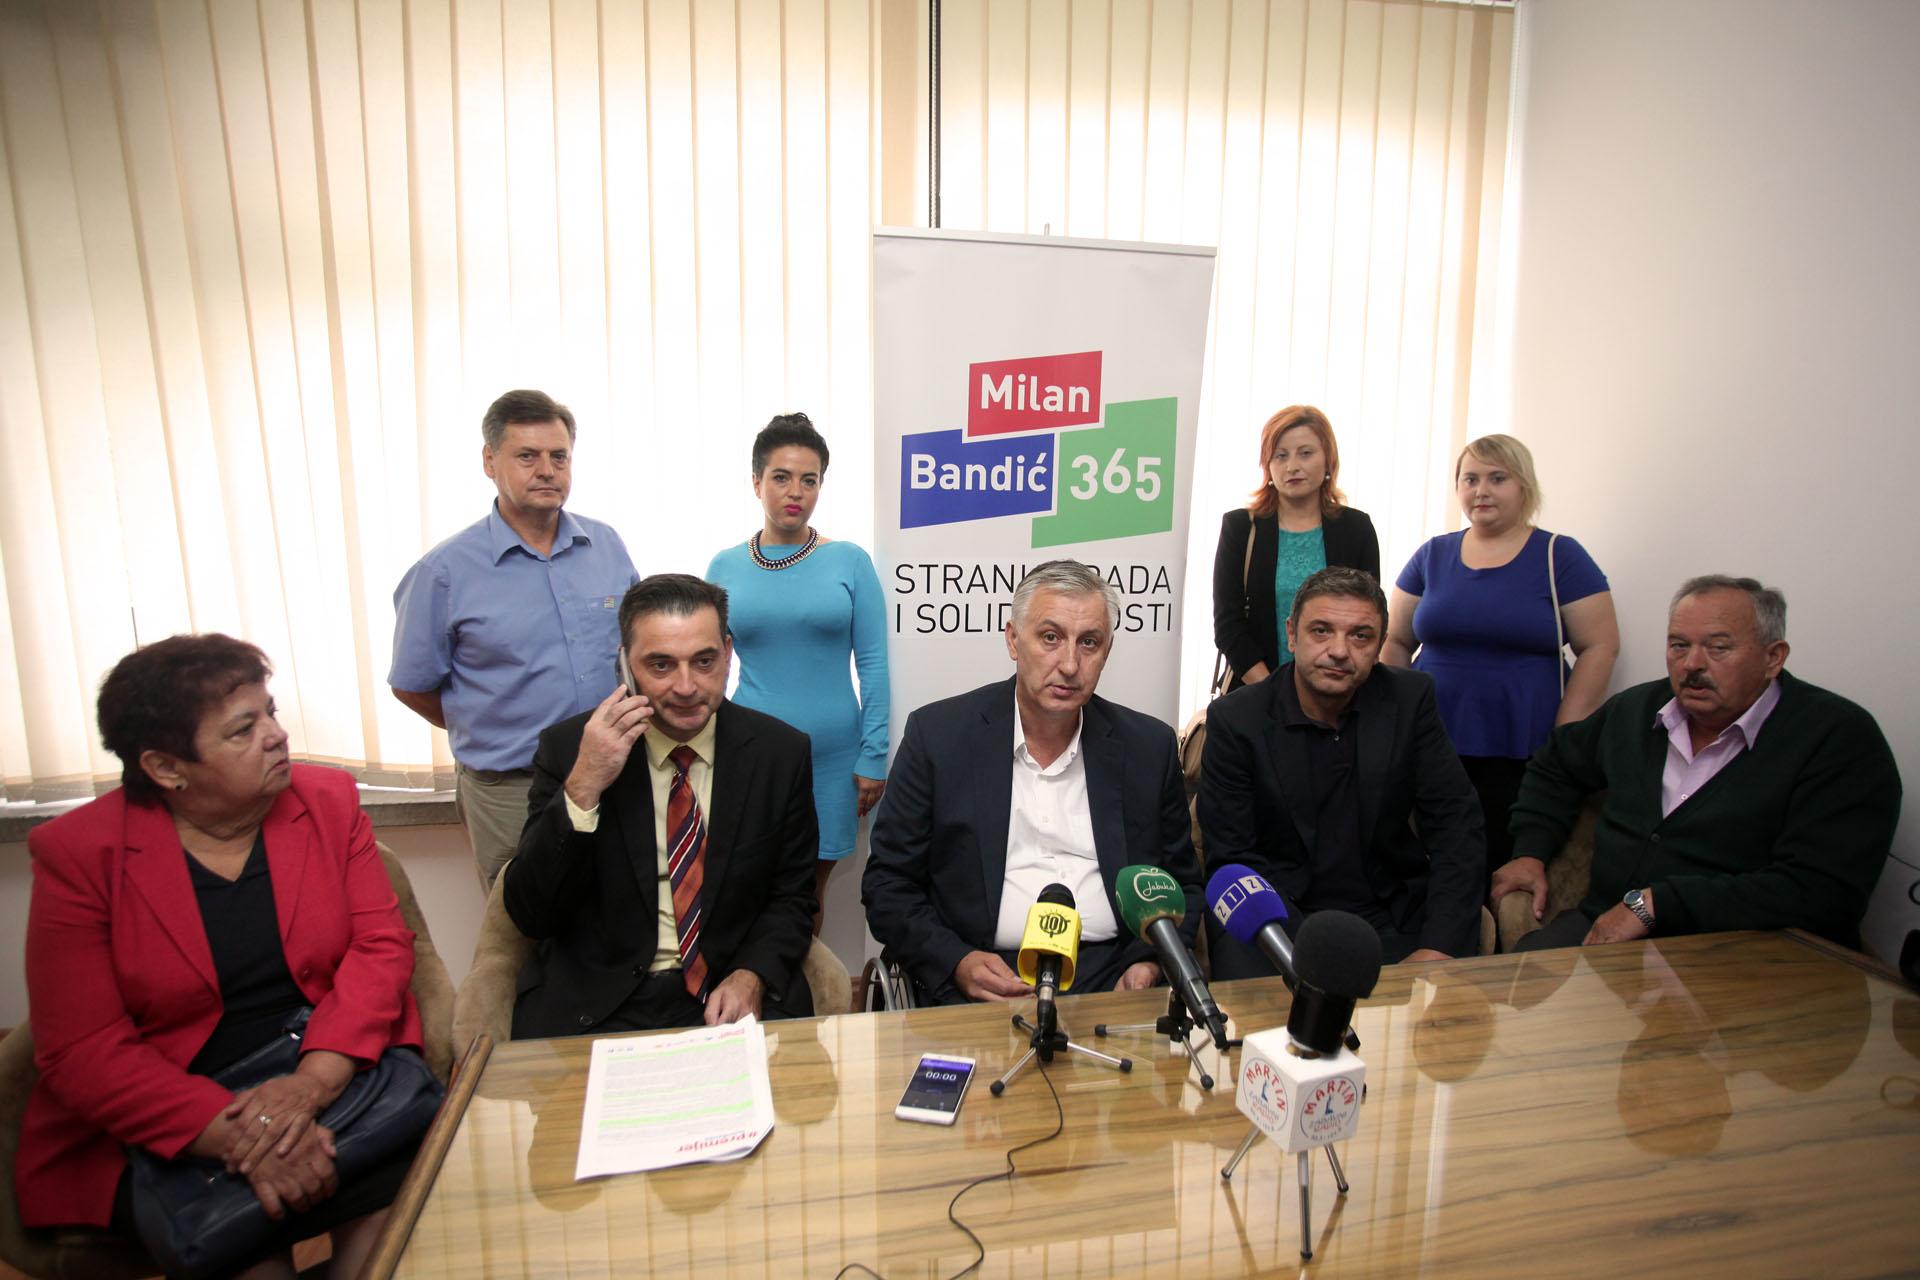 MIODRAG DEMO: Partneri propale koalicije koriste zadnje sate da unište Petrokemiju